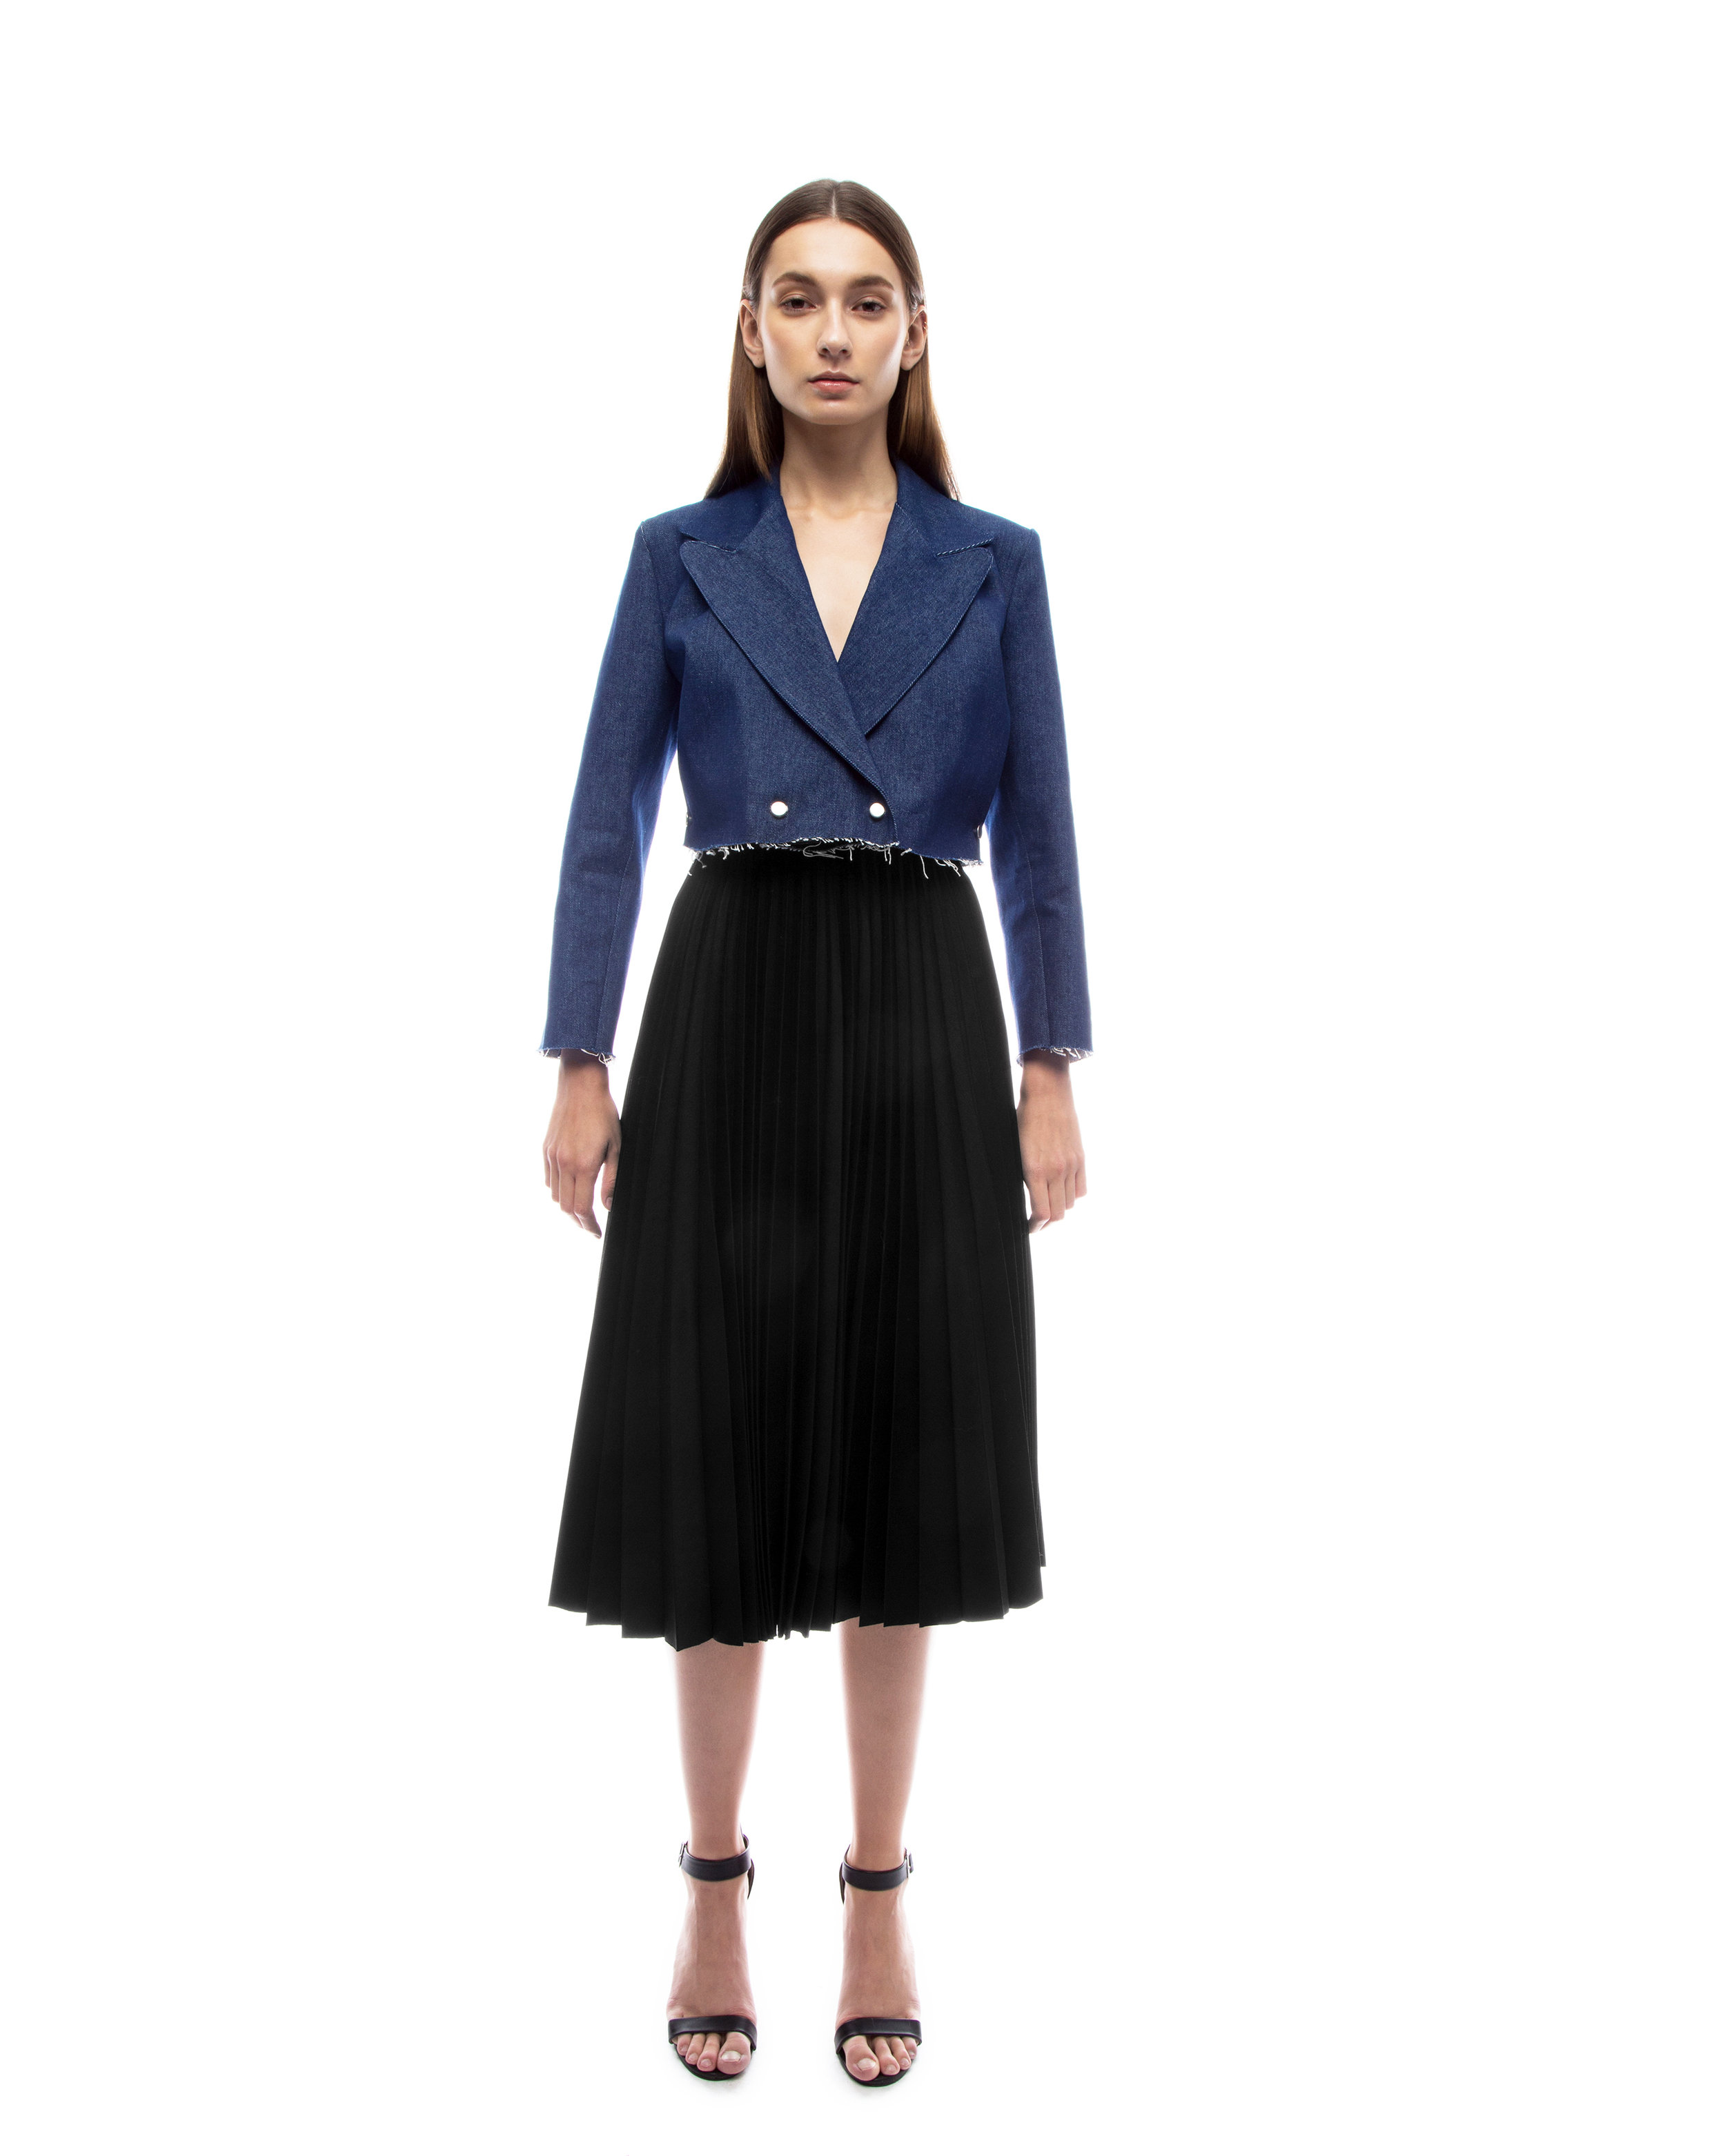 04-olya-kosterina-lapel-jacket-front.jpg